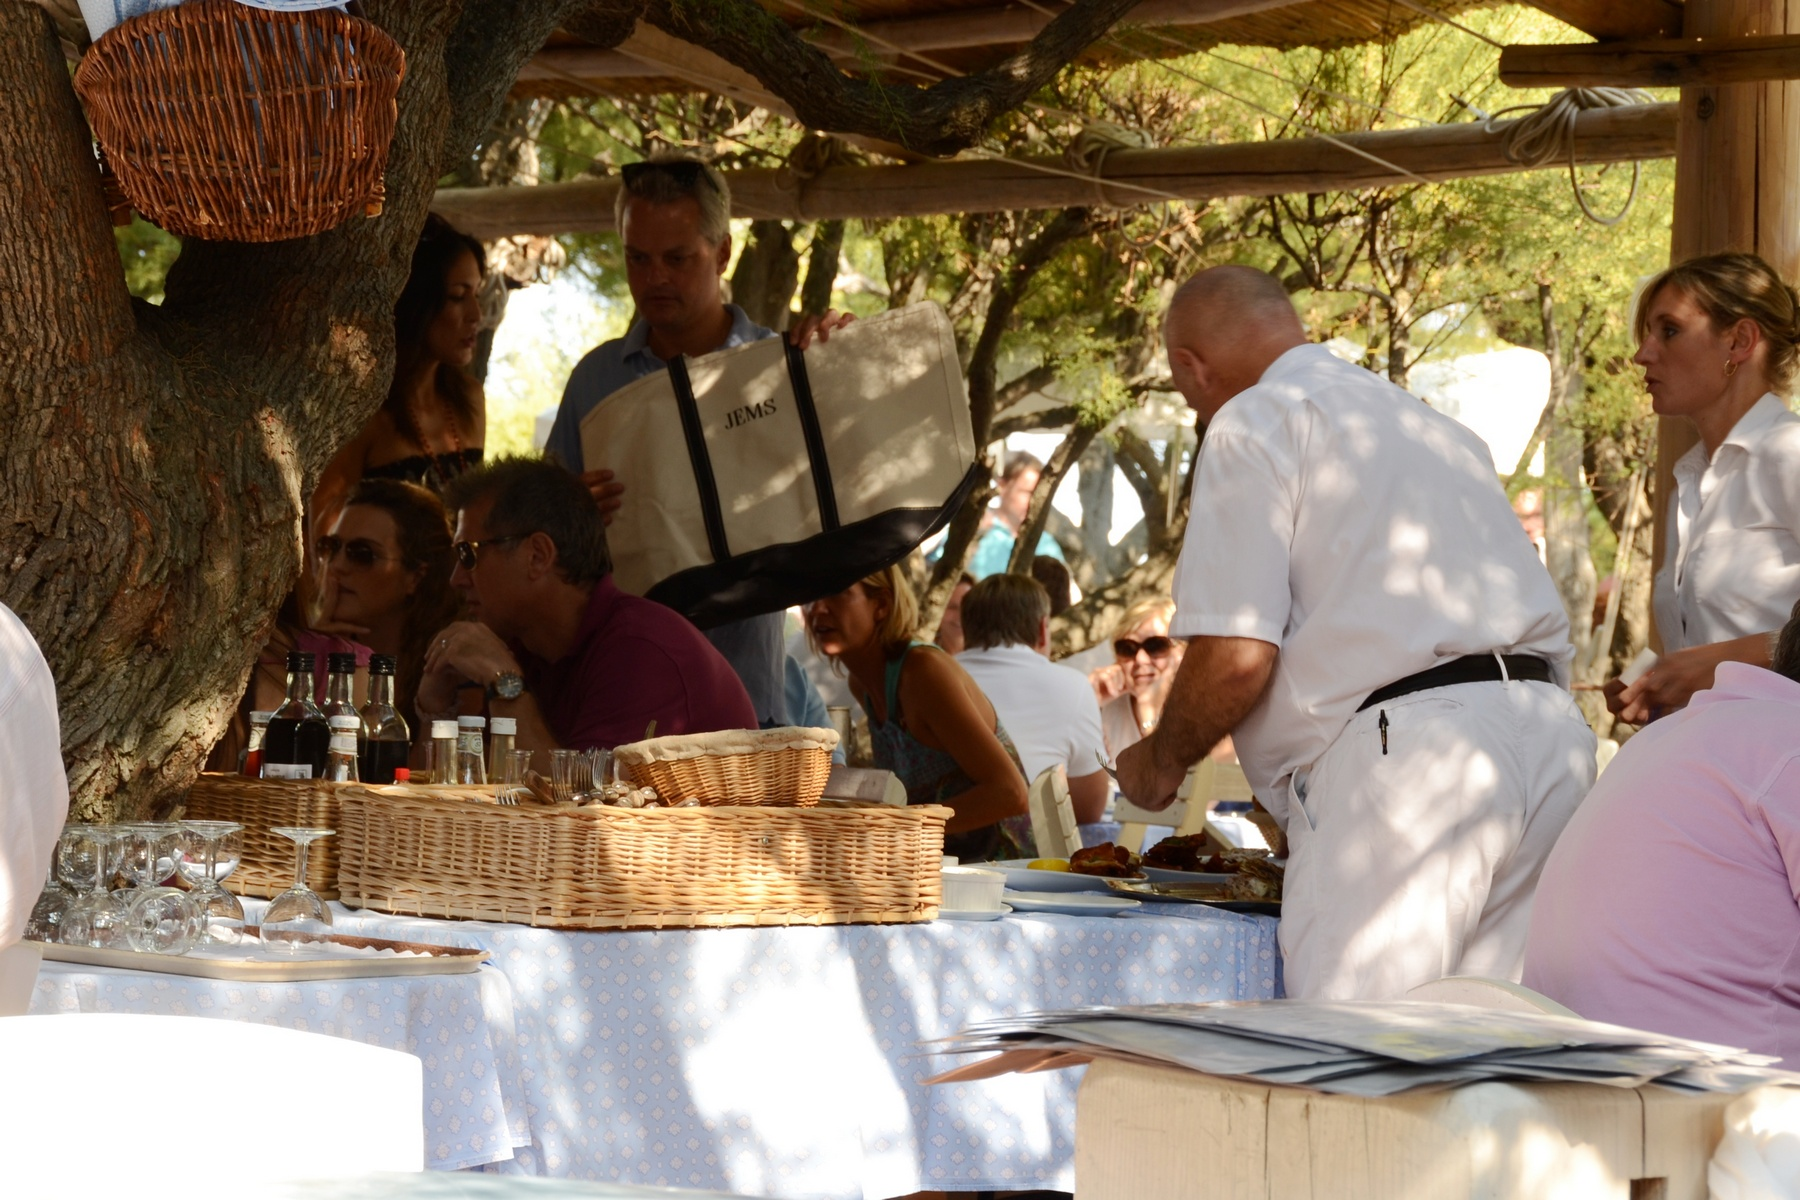 Beach Club 55 - St Tropez Ramatuelle - Saint Tropez